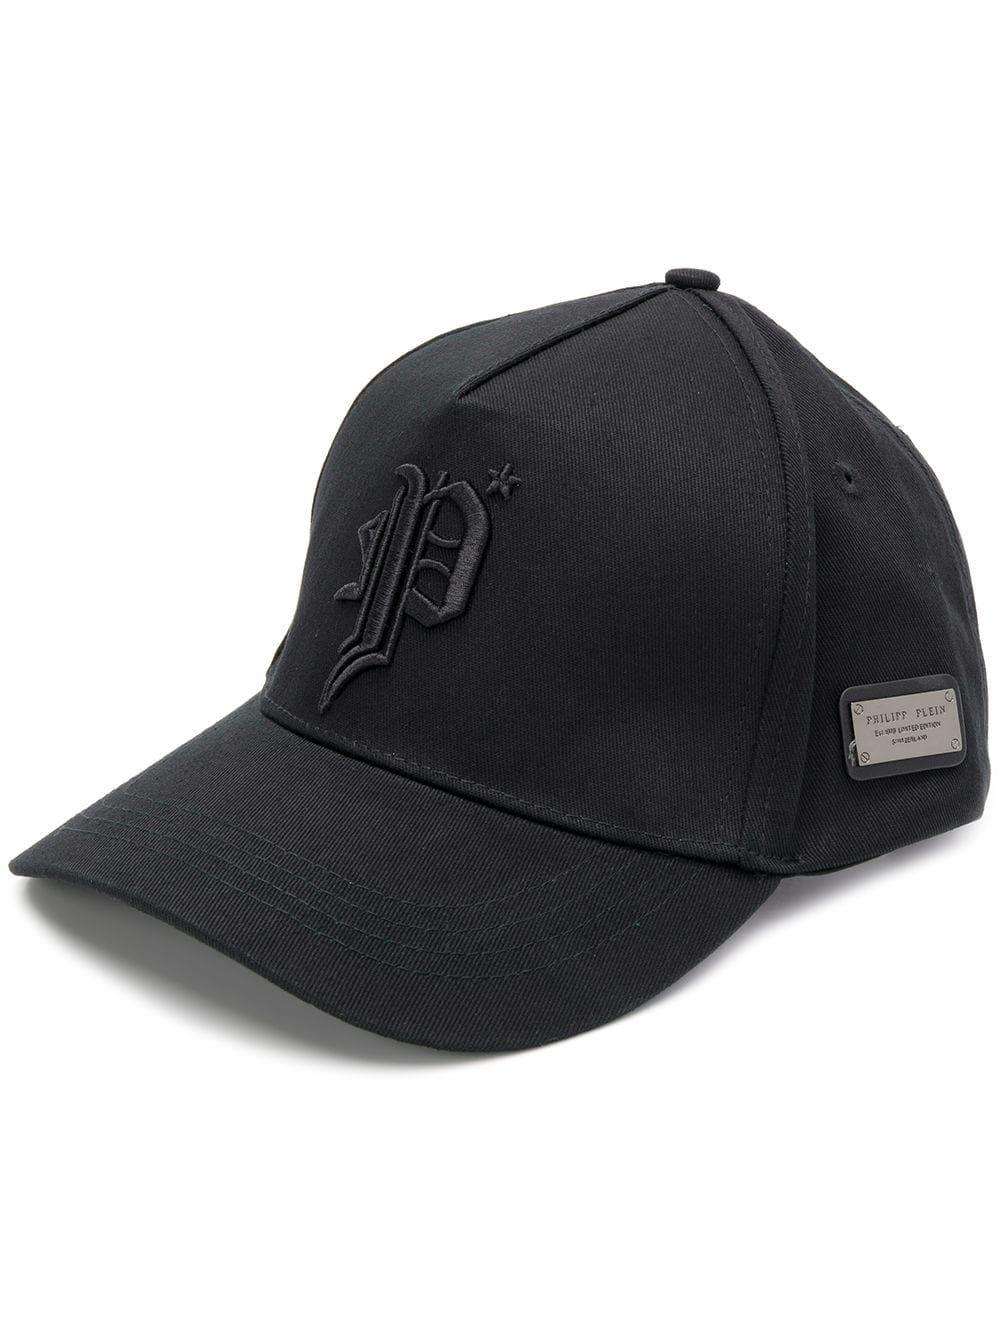 8314b38c PHILIPP PLEIN PHILIPP PLEIN GOTHIC BASEBALL FLAT CAP - BLACK ...